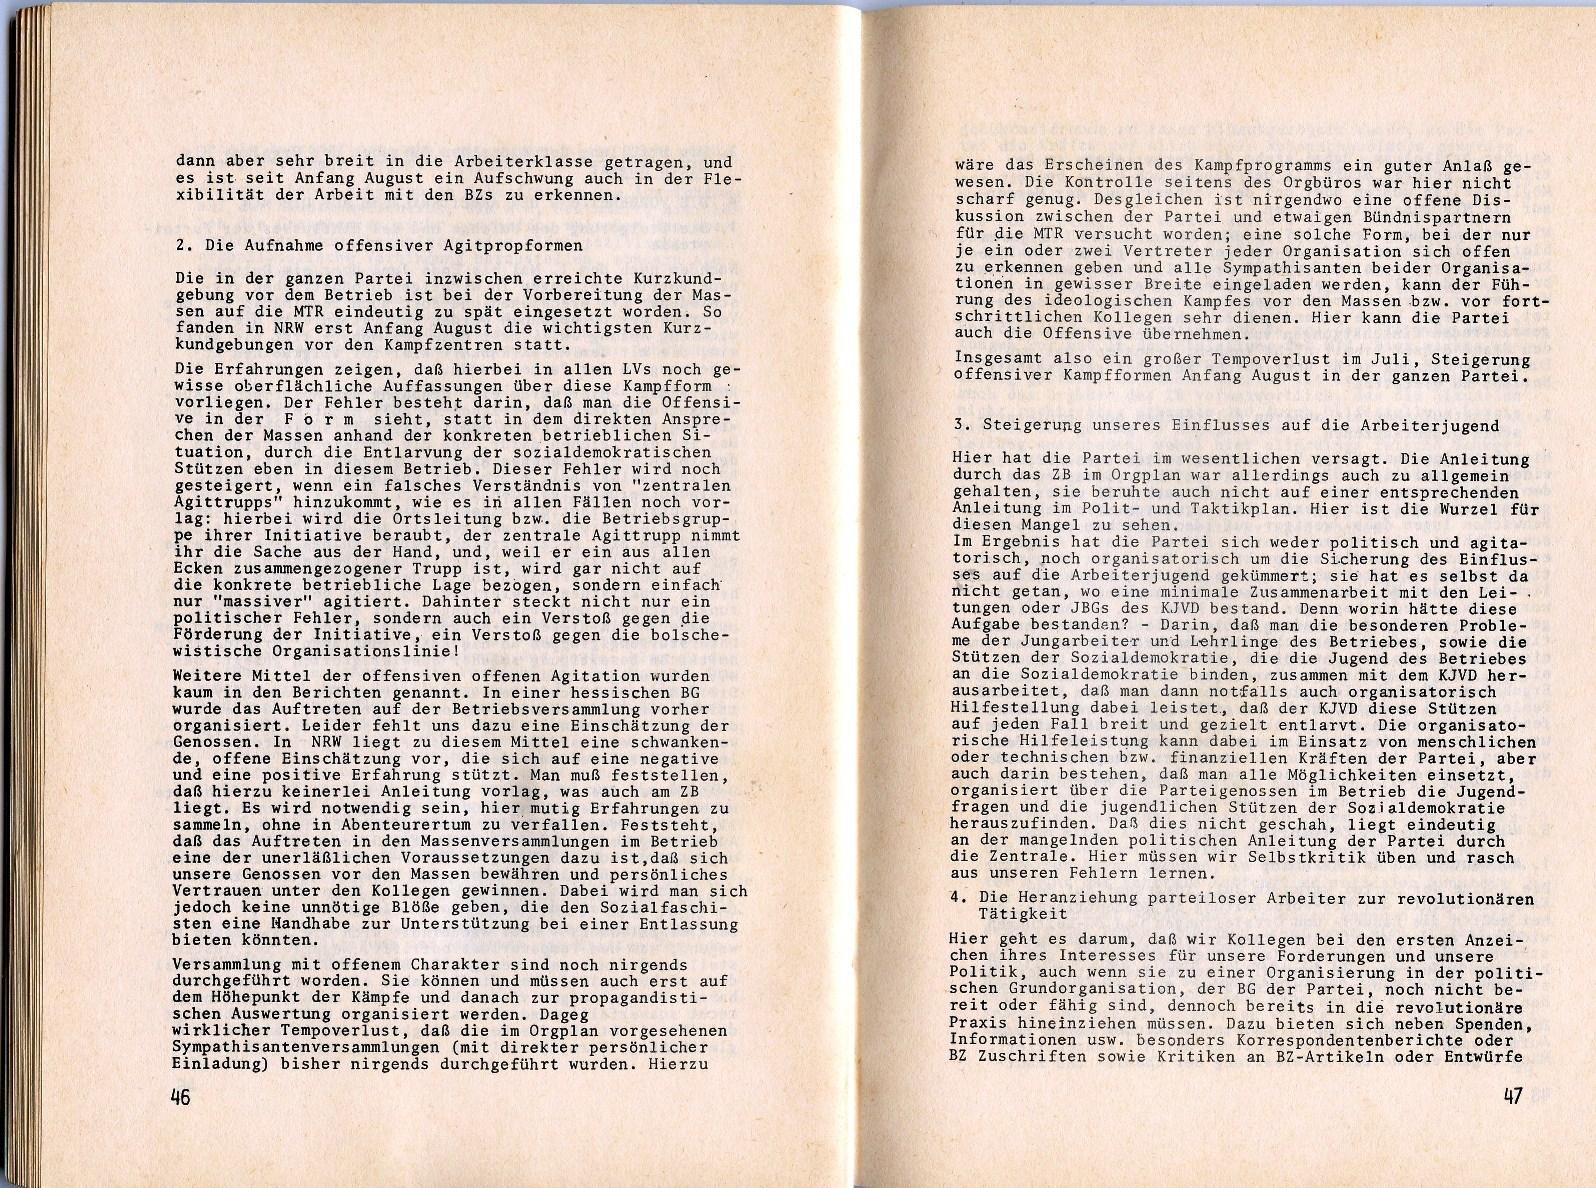 ZB_Parteiarbeiter_1971_07_25